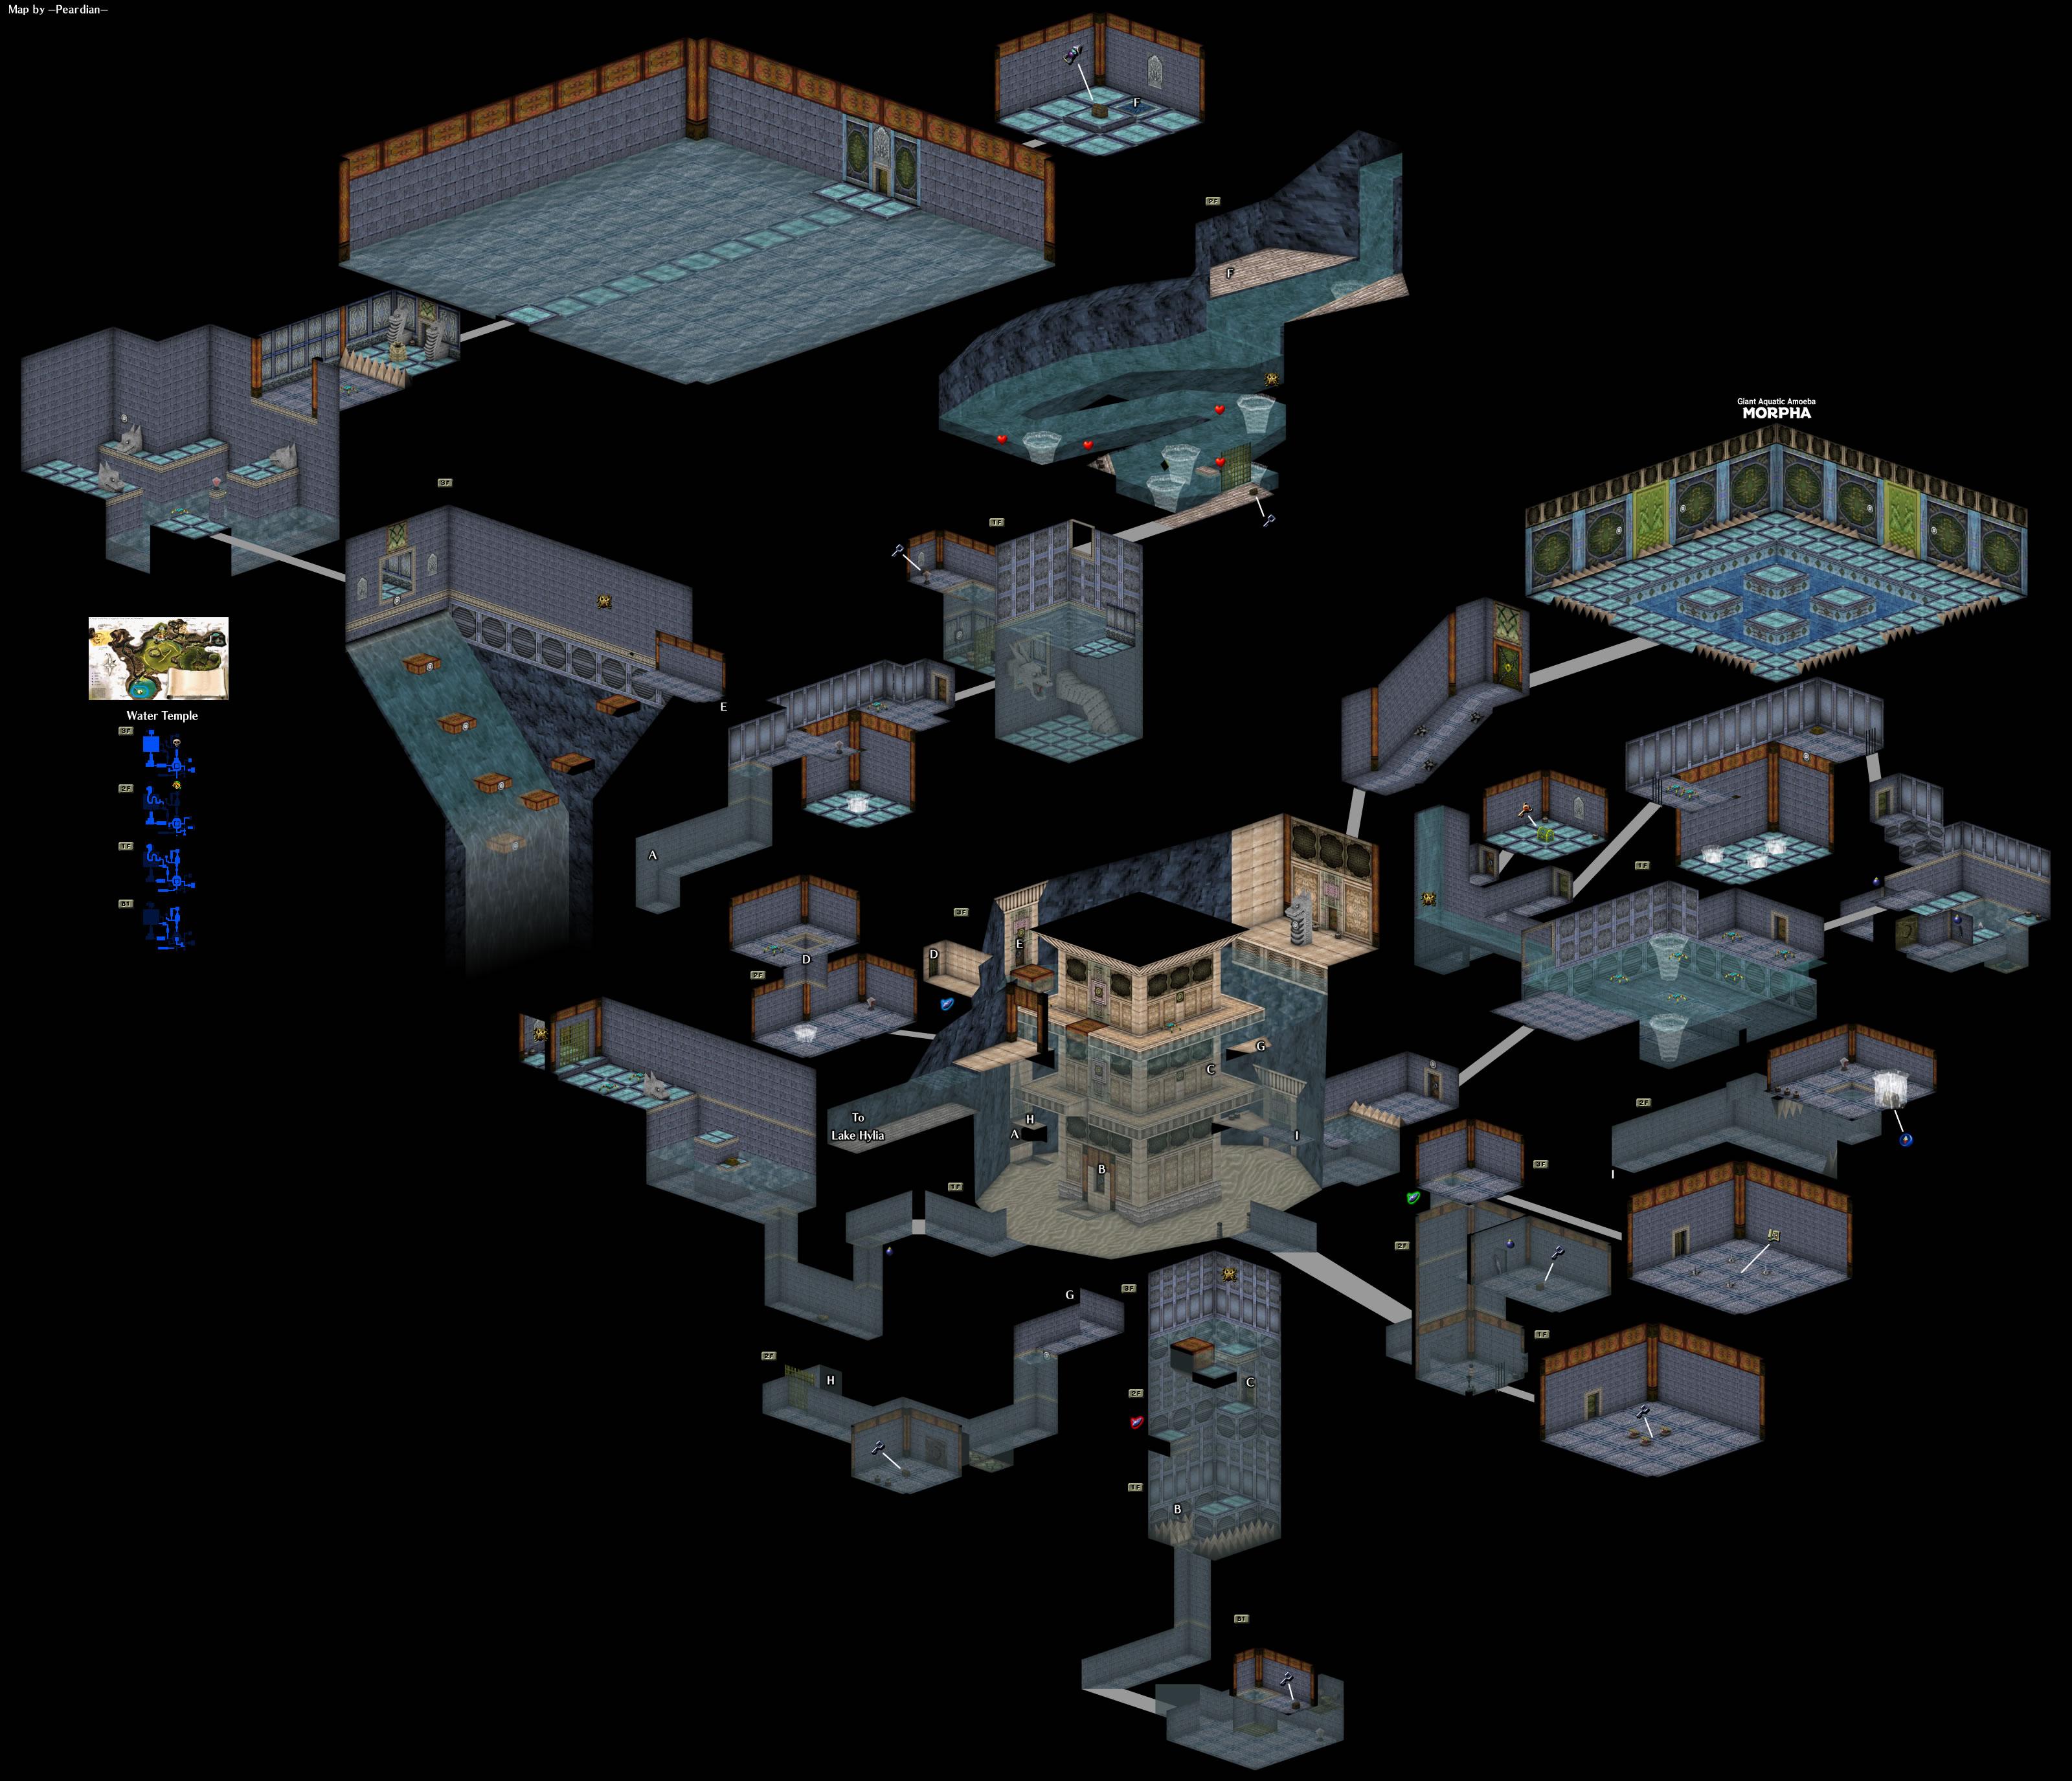 LegendOfZelda-OcarinaOfTime-Future-WaterTemple(Side).jpg